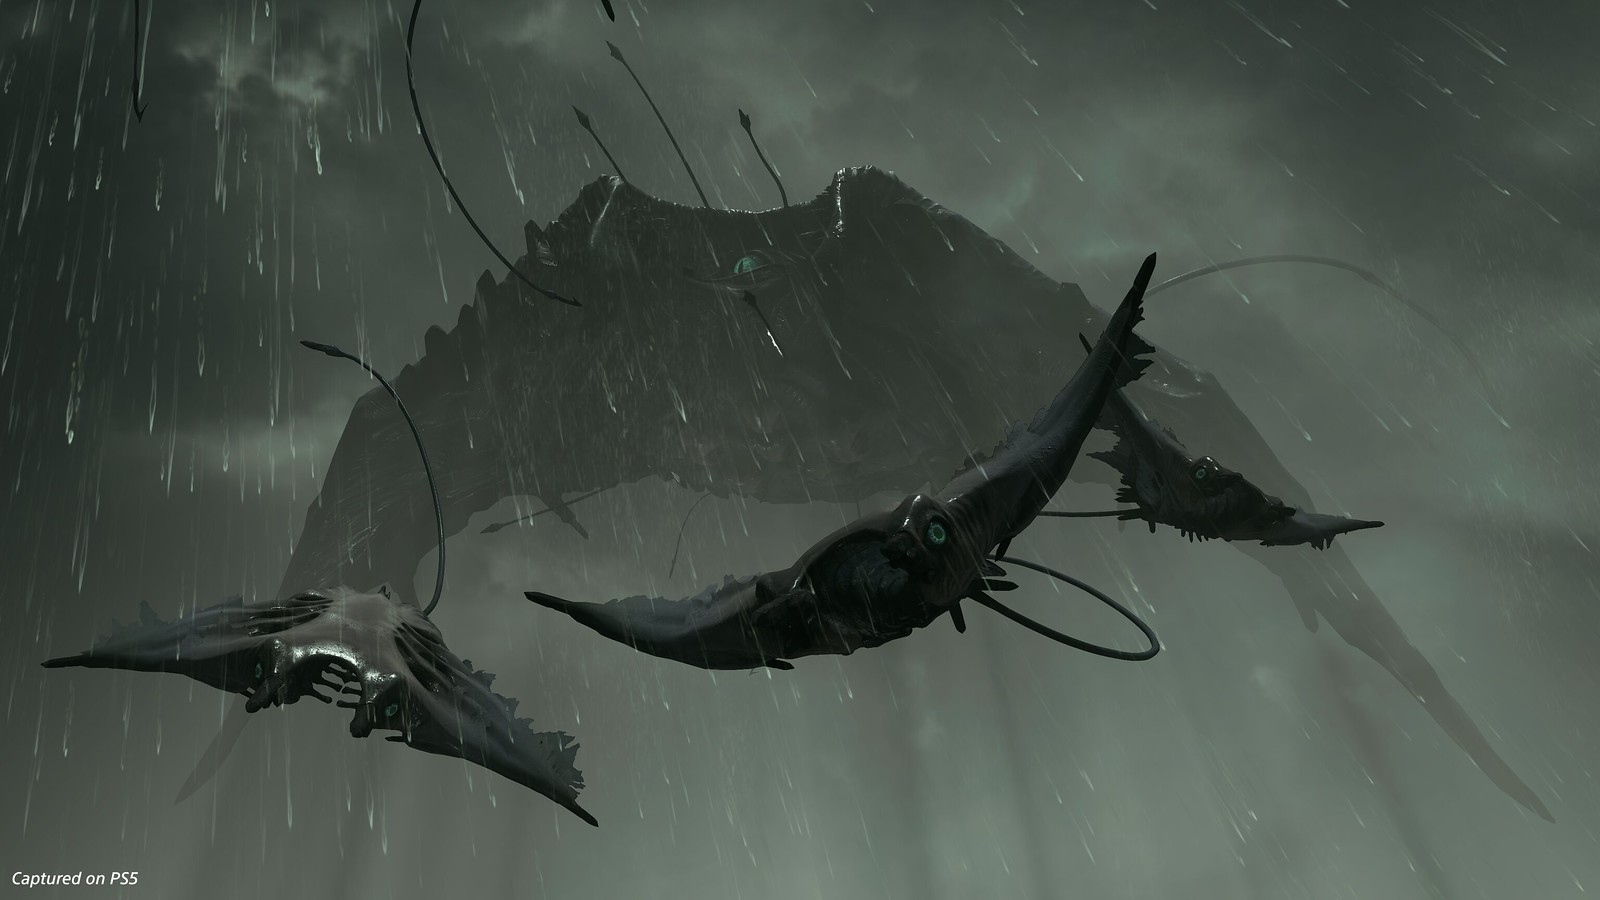 Demon's Souls - Storm King